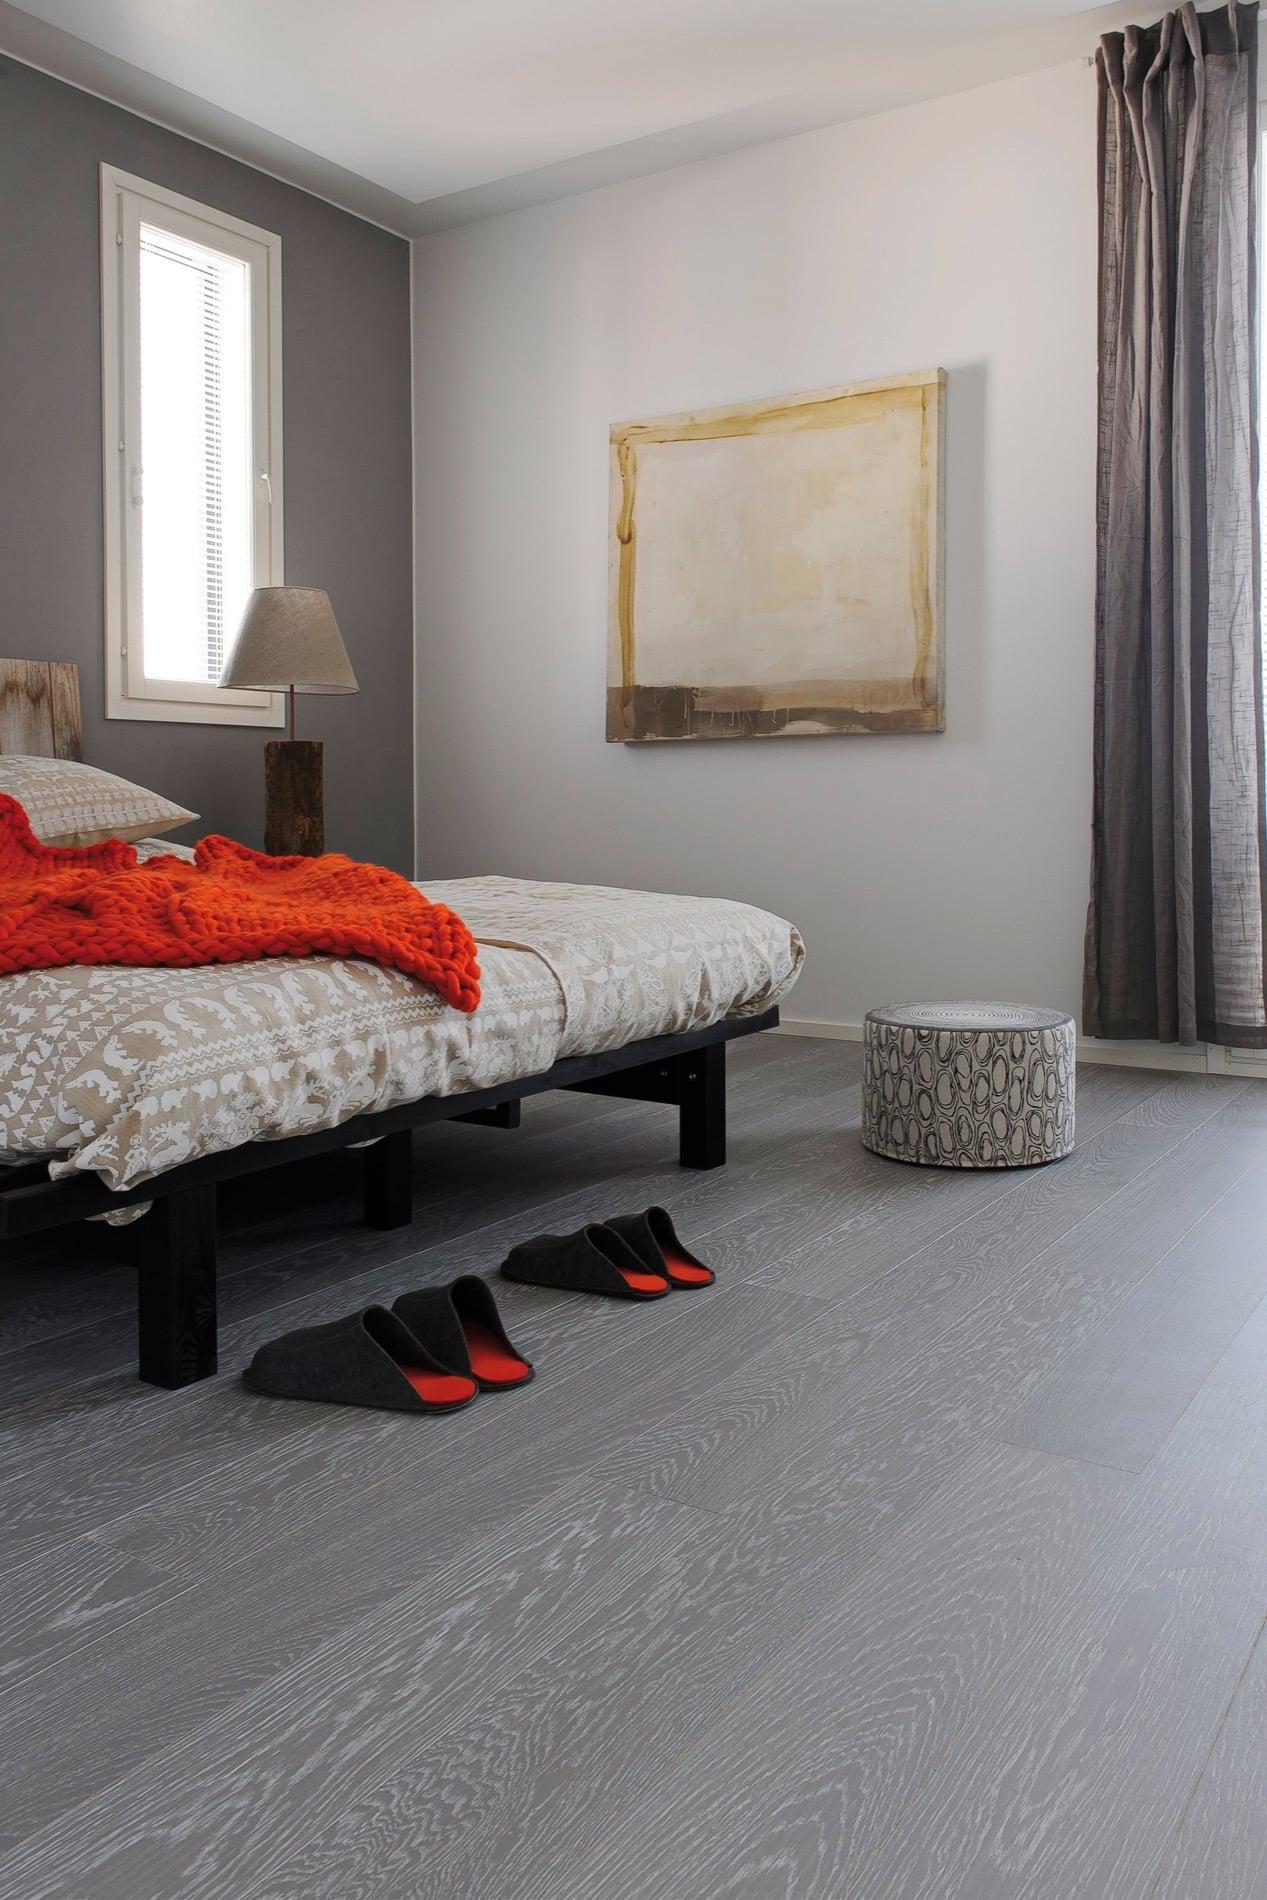 Timberwise parketti puulattia wooden floor parquet Tammi Oak Silver_pysty3